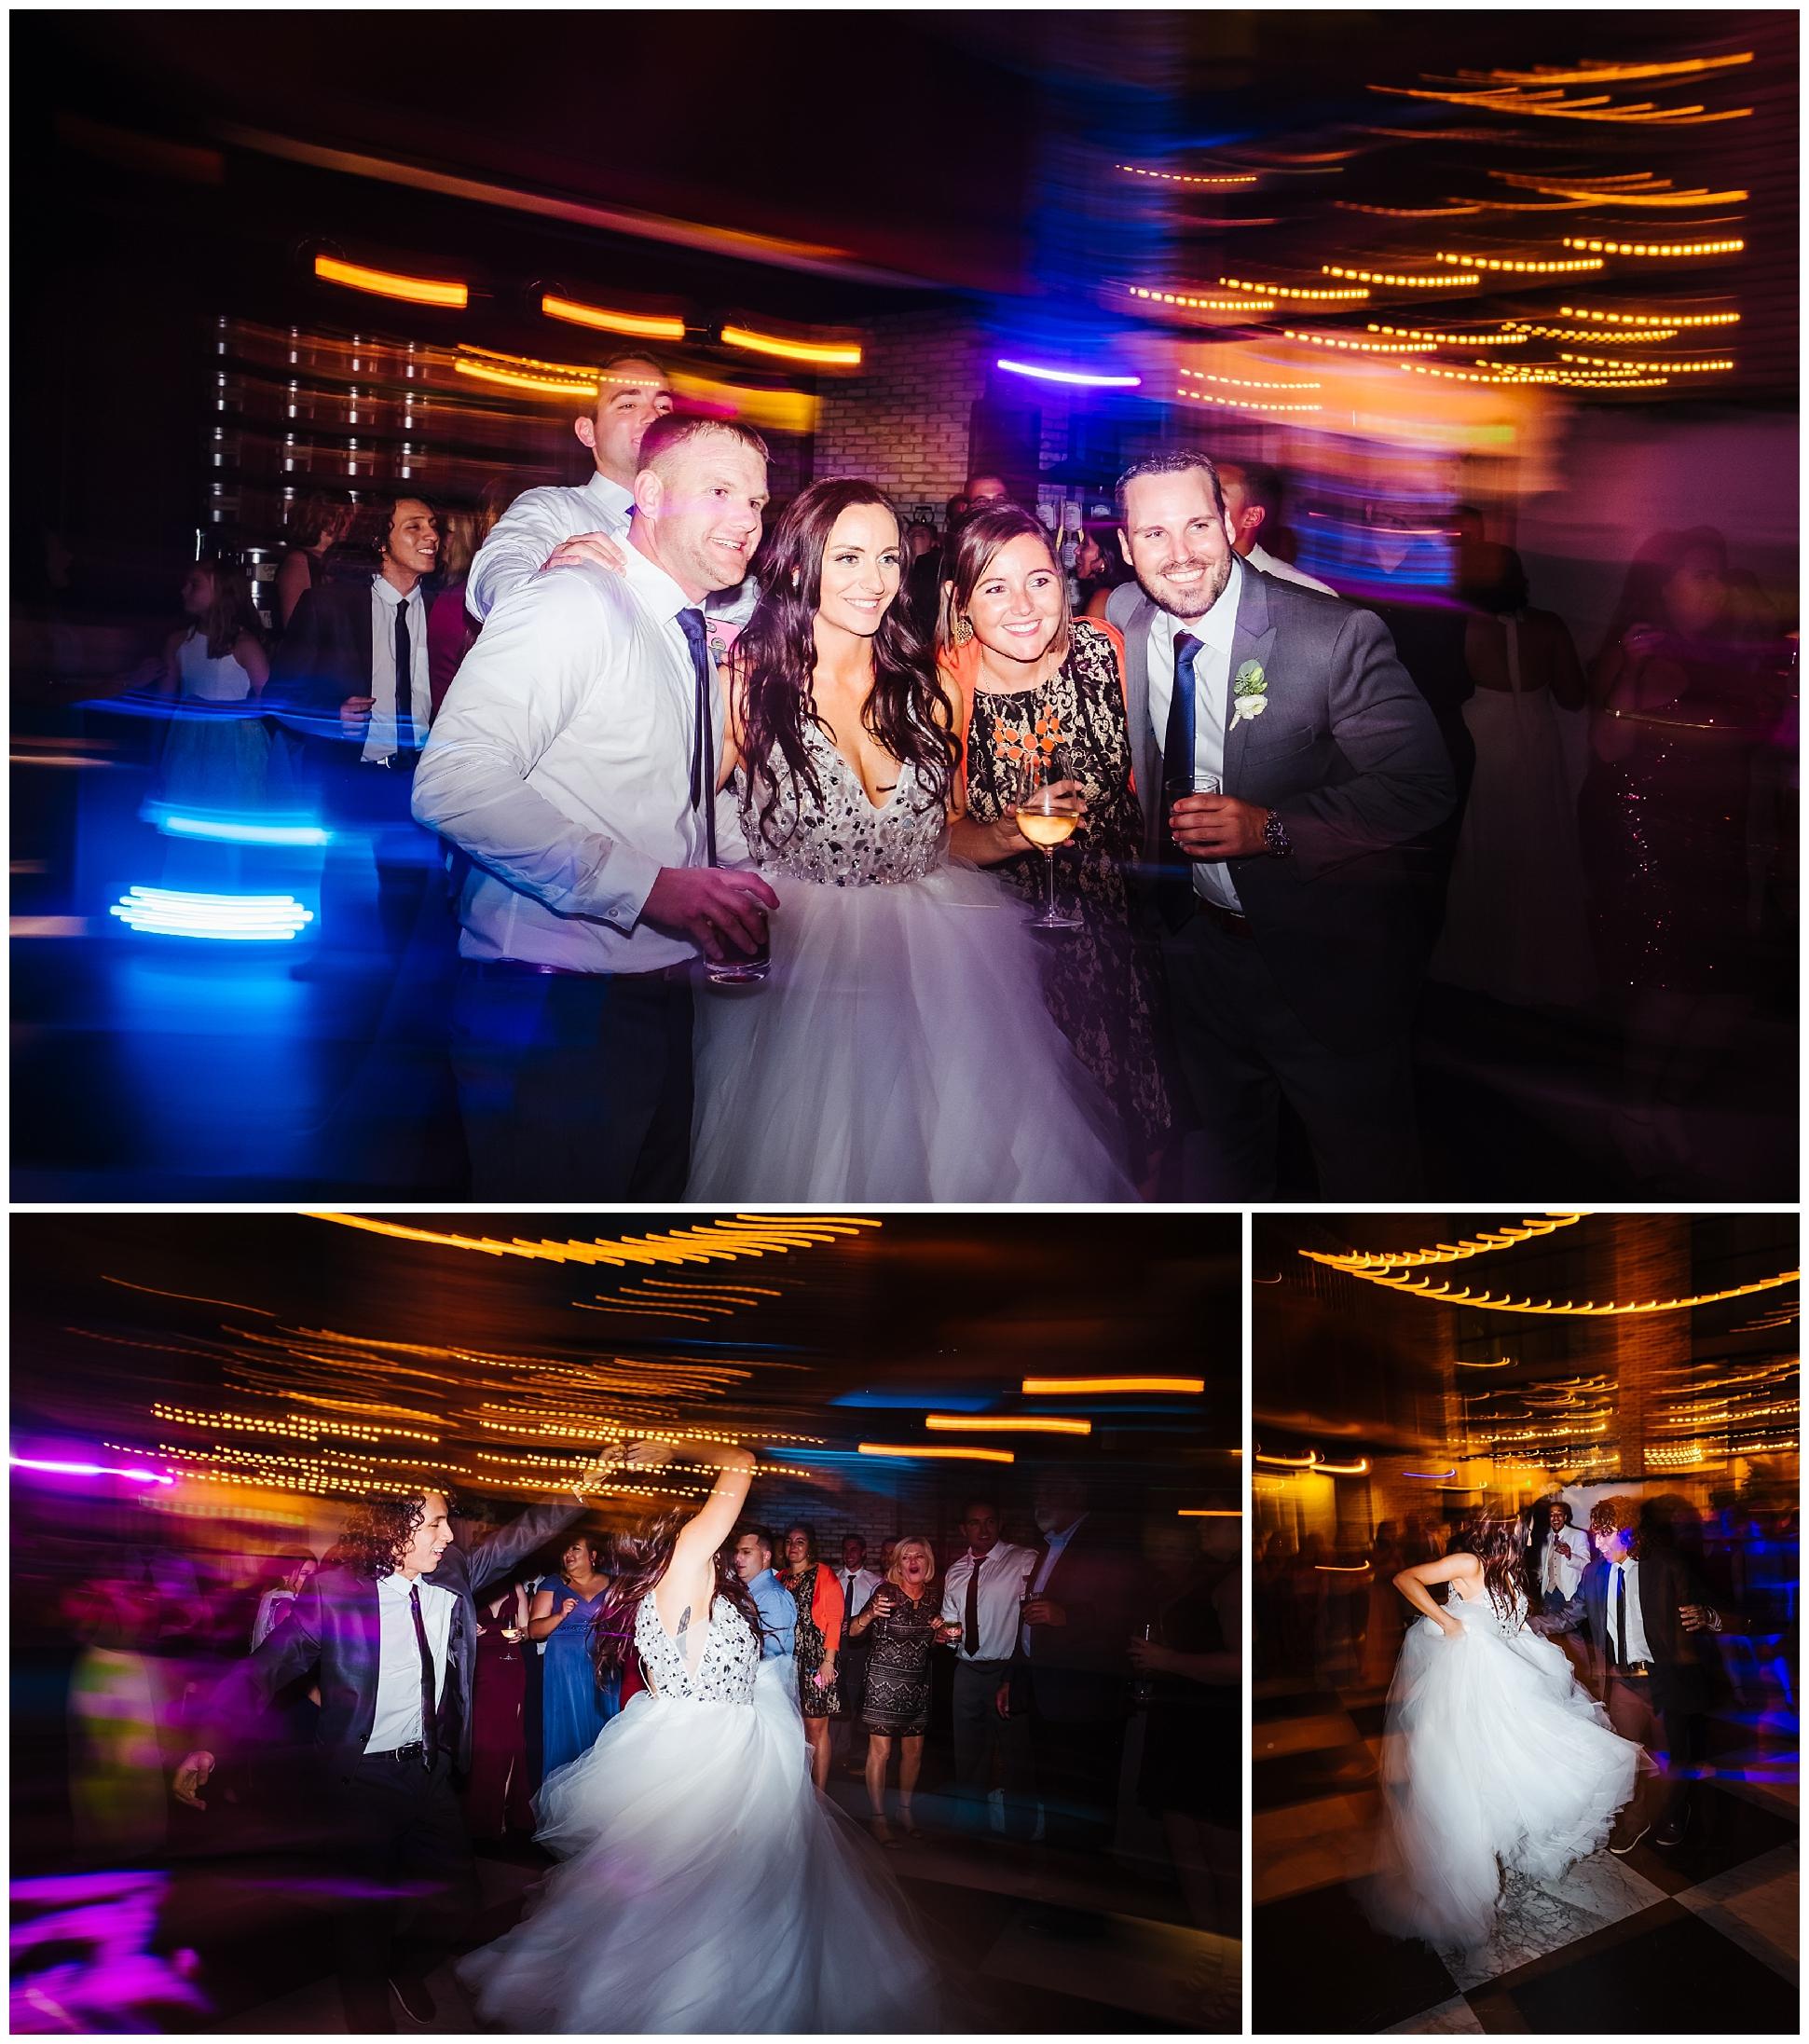 tampa-wedding-photographer-oxford-exchange-garland-candlelight-gold-hayley-paige_0059.jpg